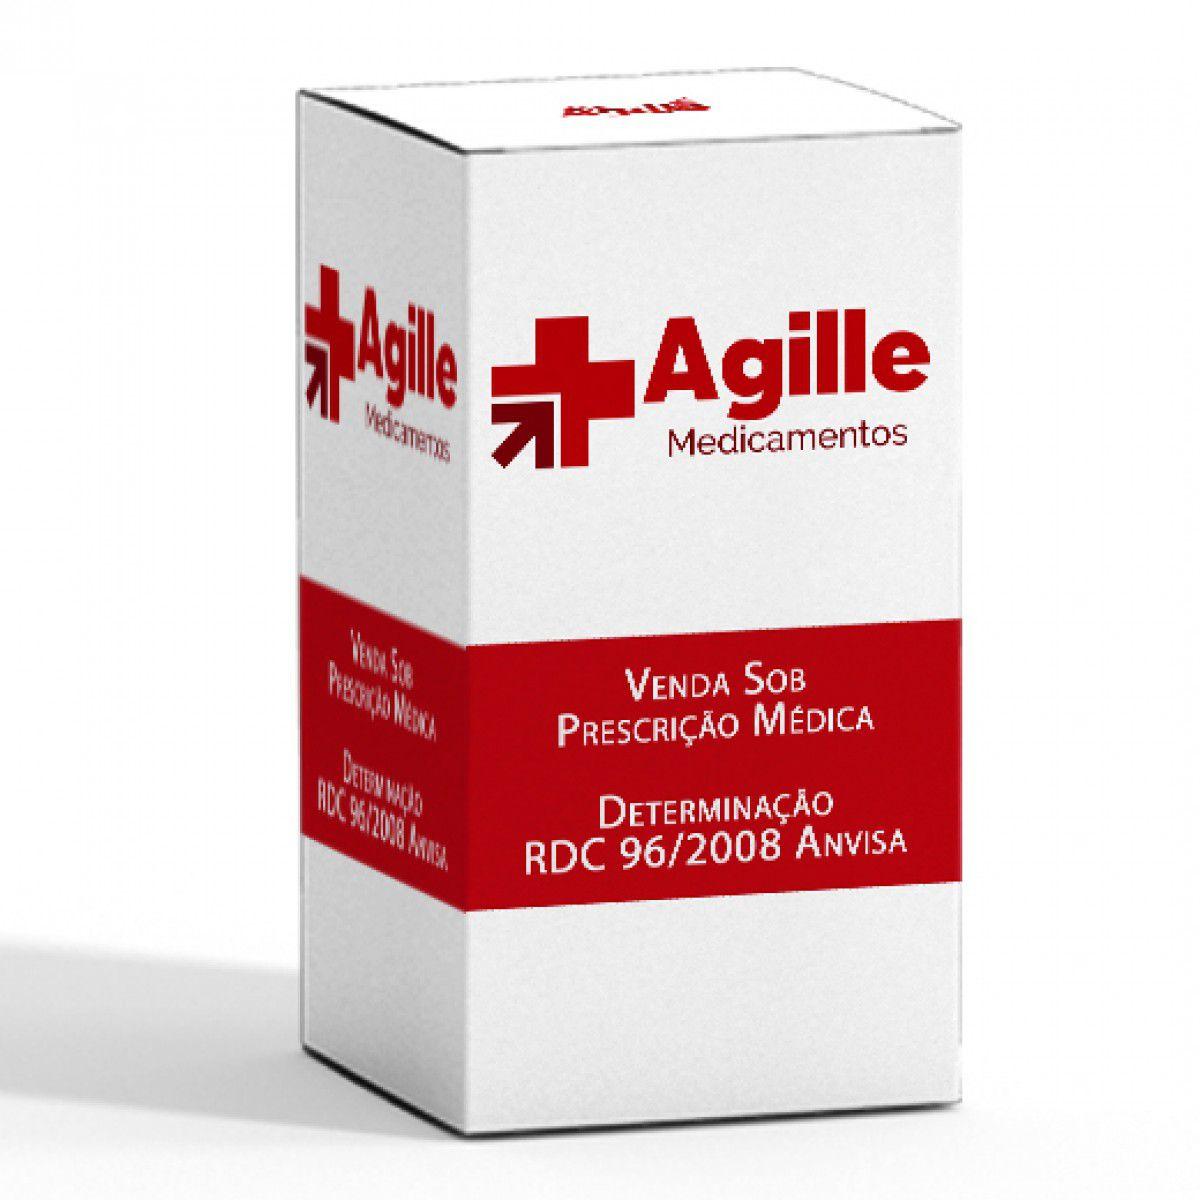 FAULDVINCRI 1MG SOL INJ 5 FR X 1ML  - Agille Speciality